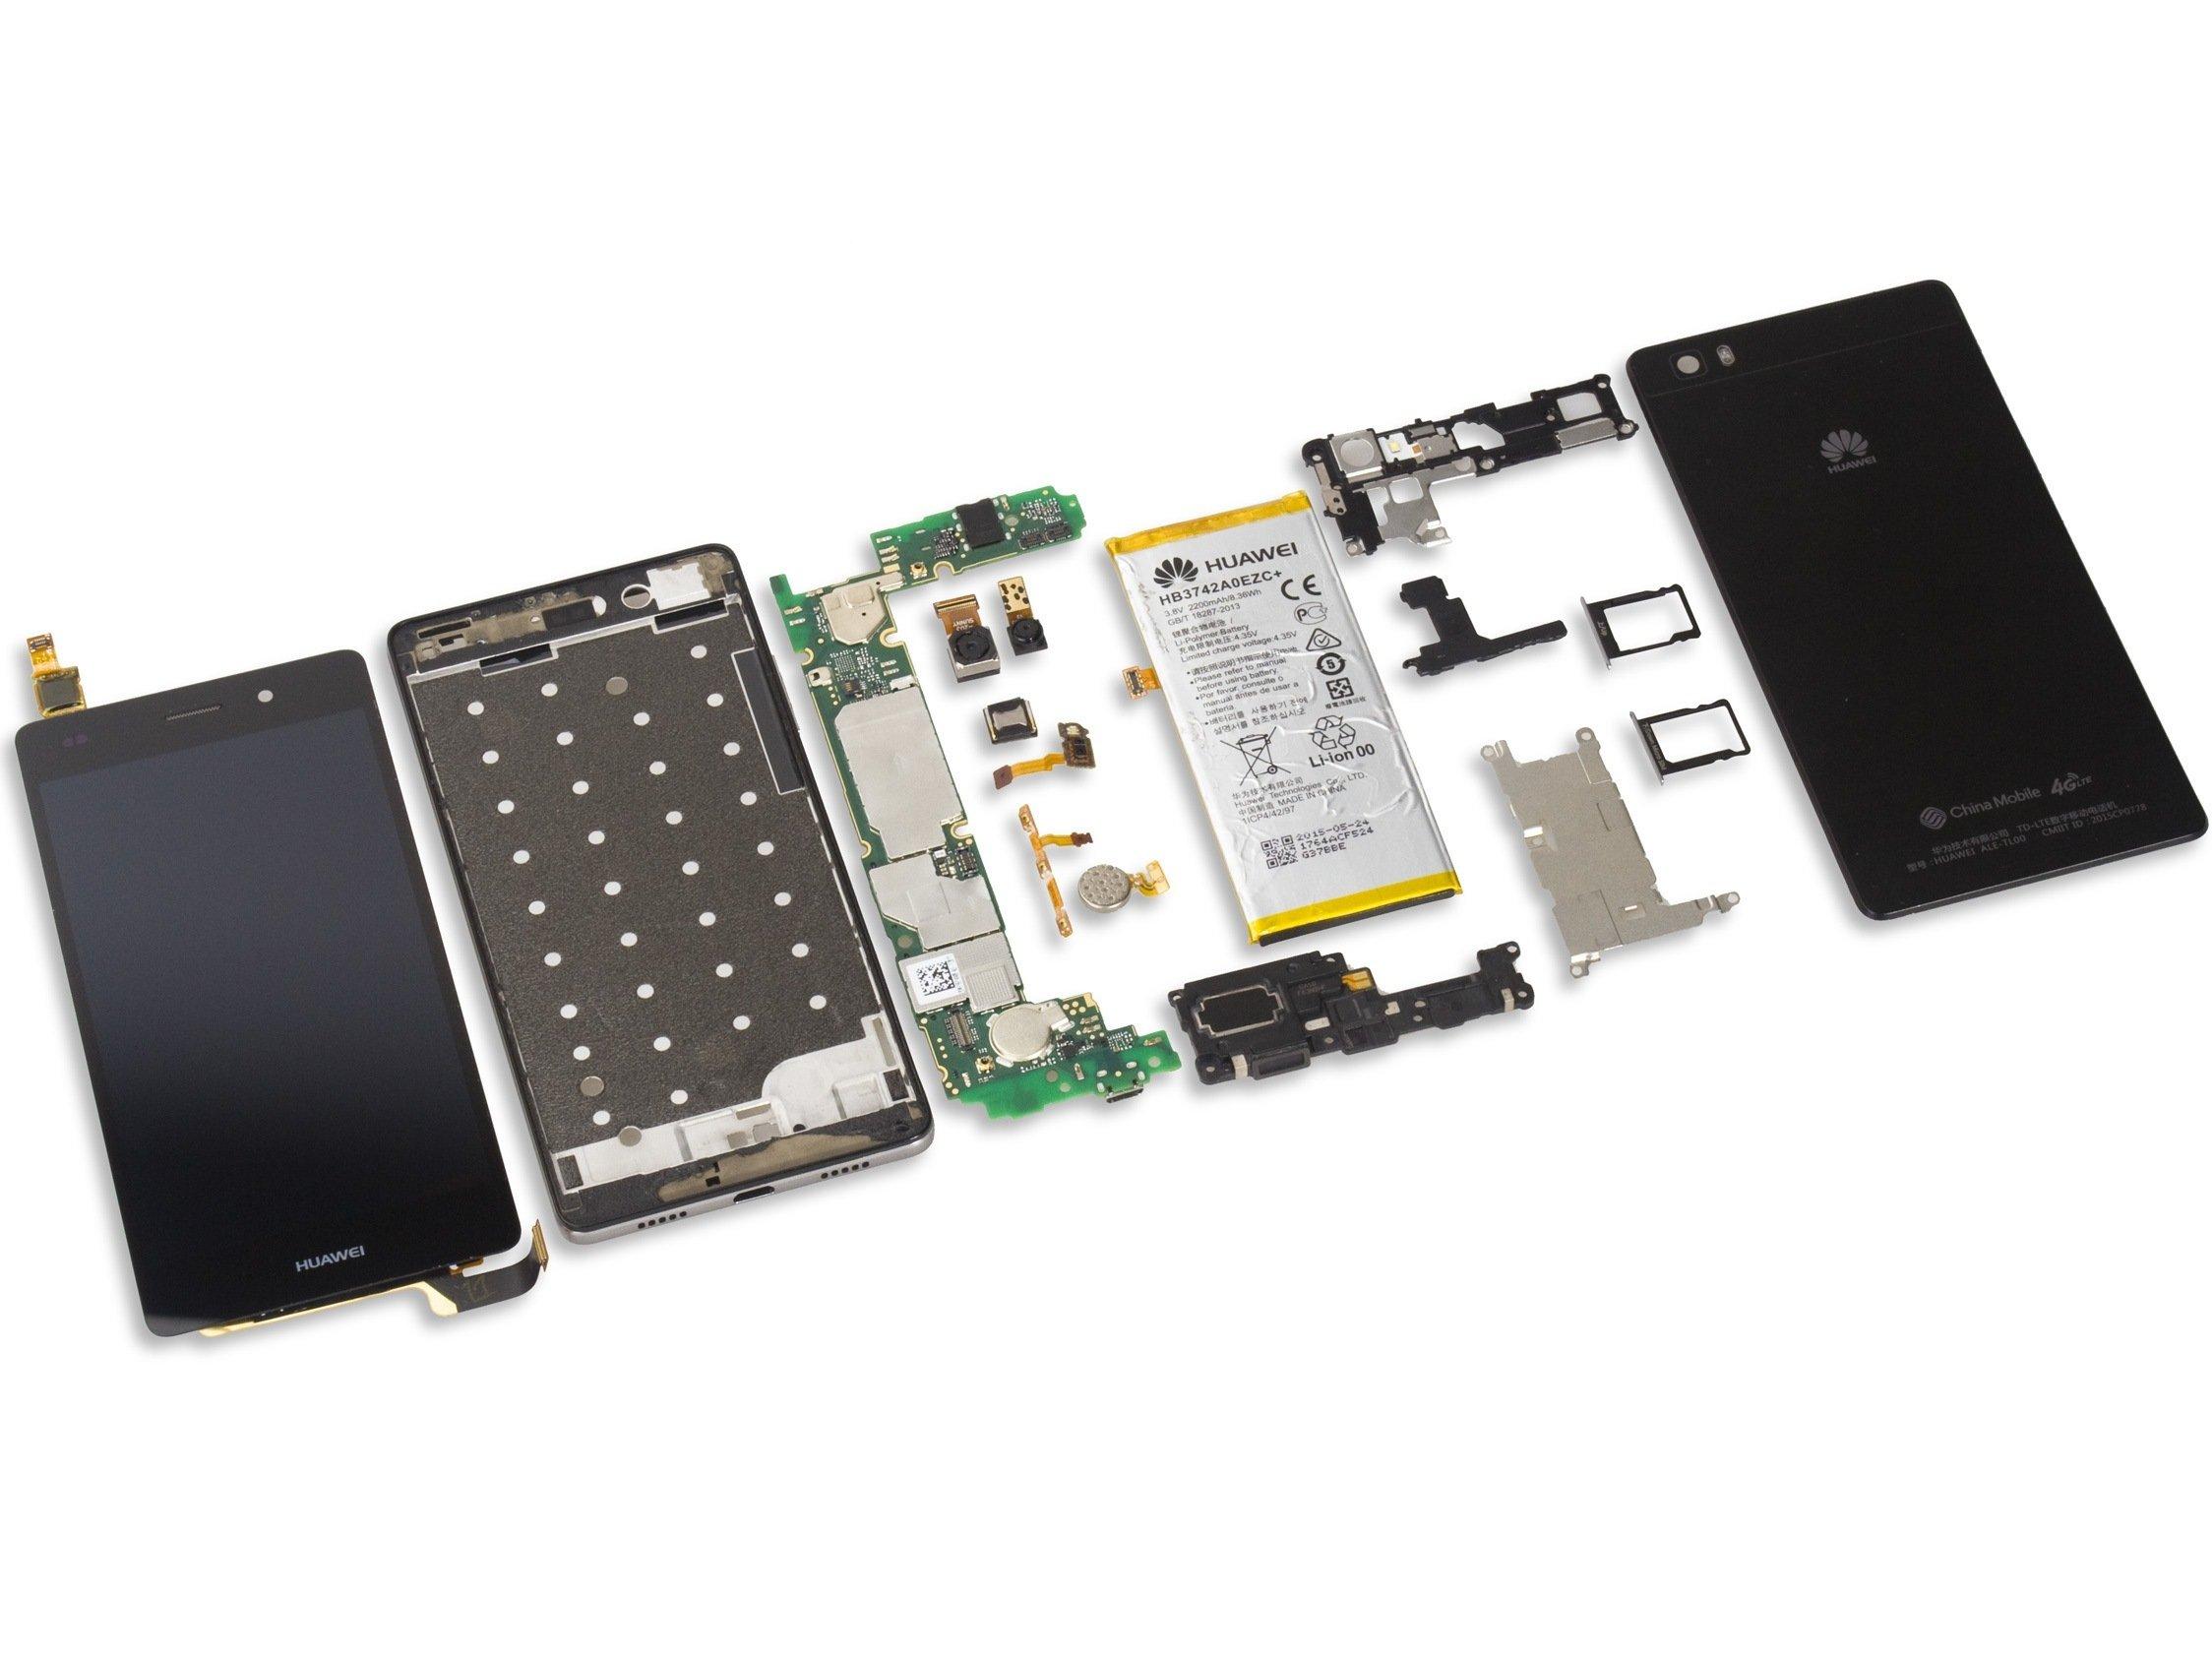 Huawei P8 Lite Teardown